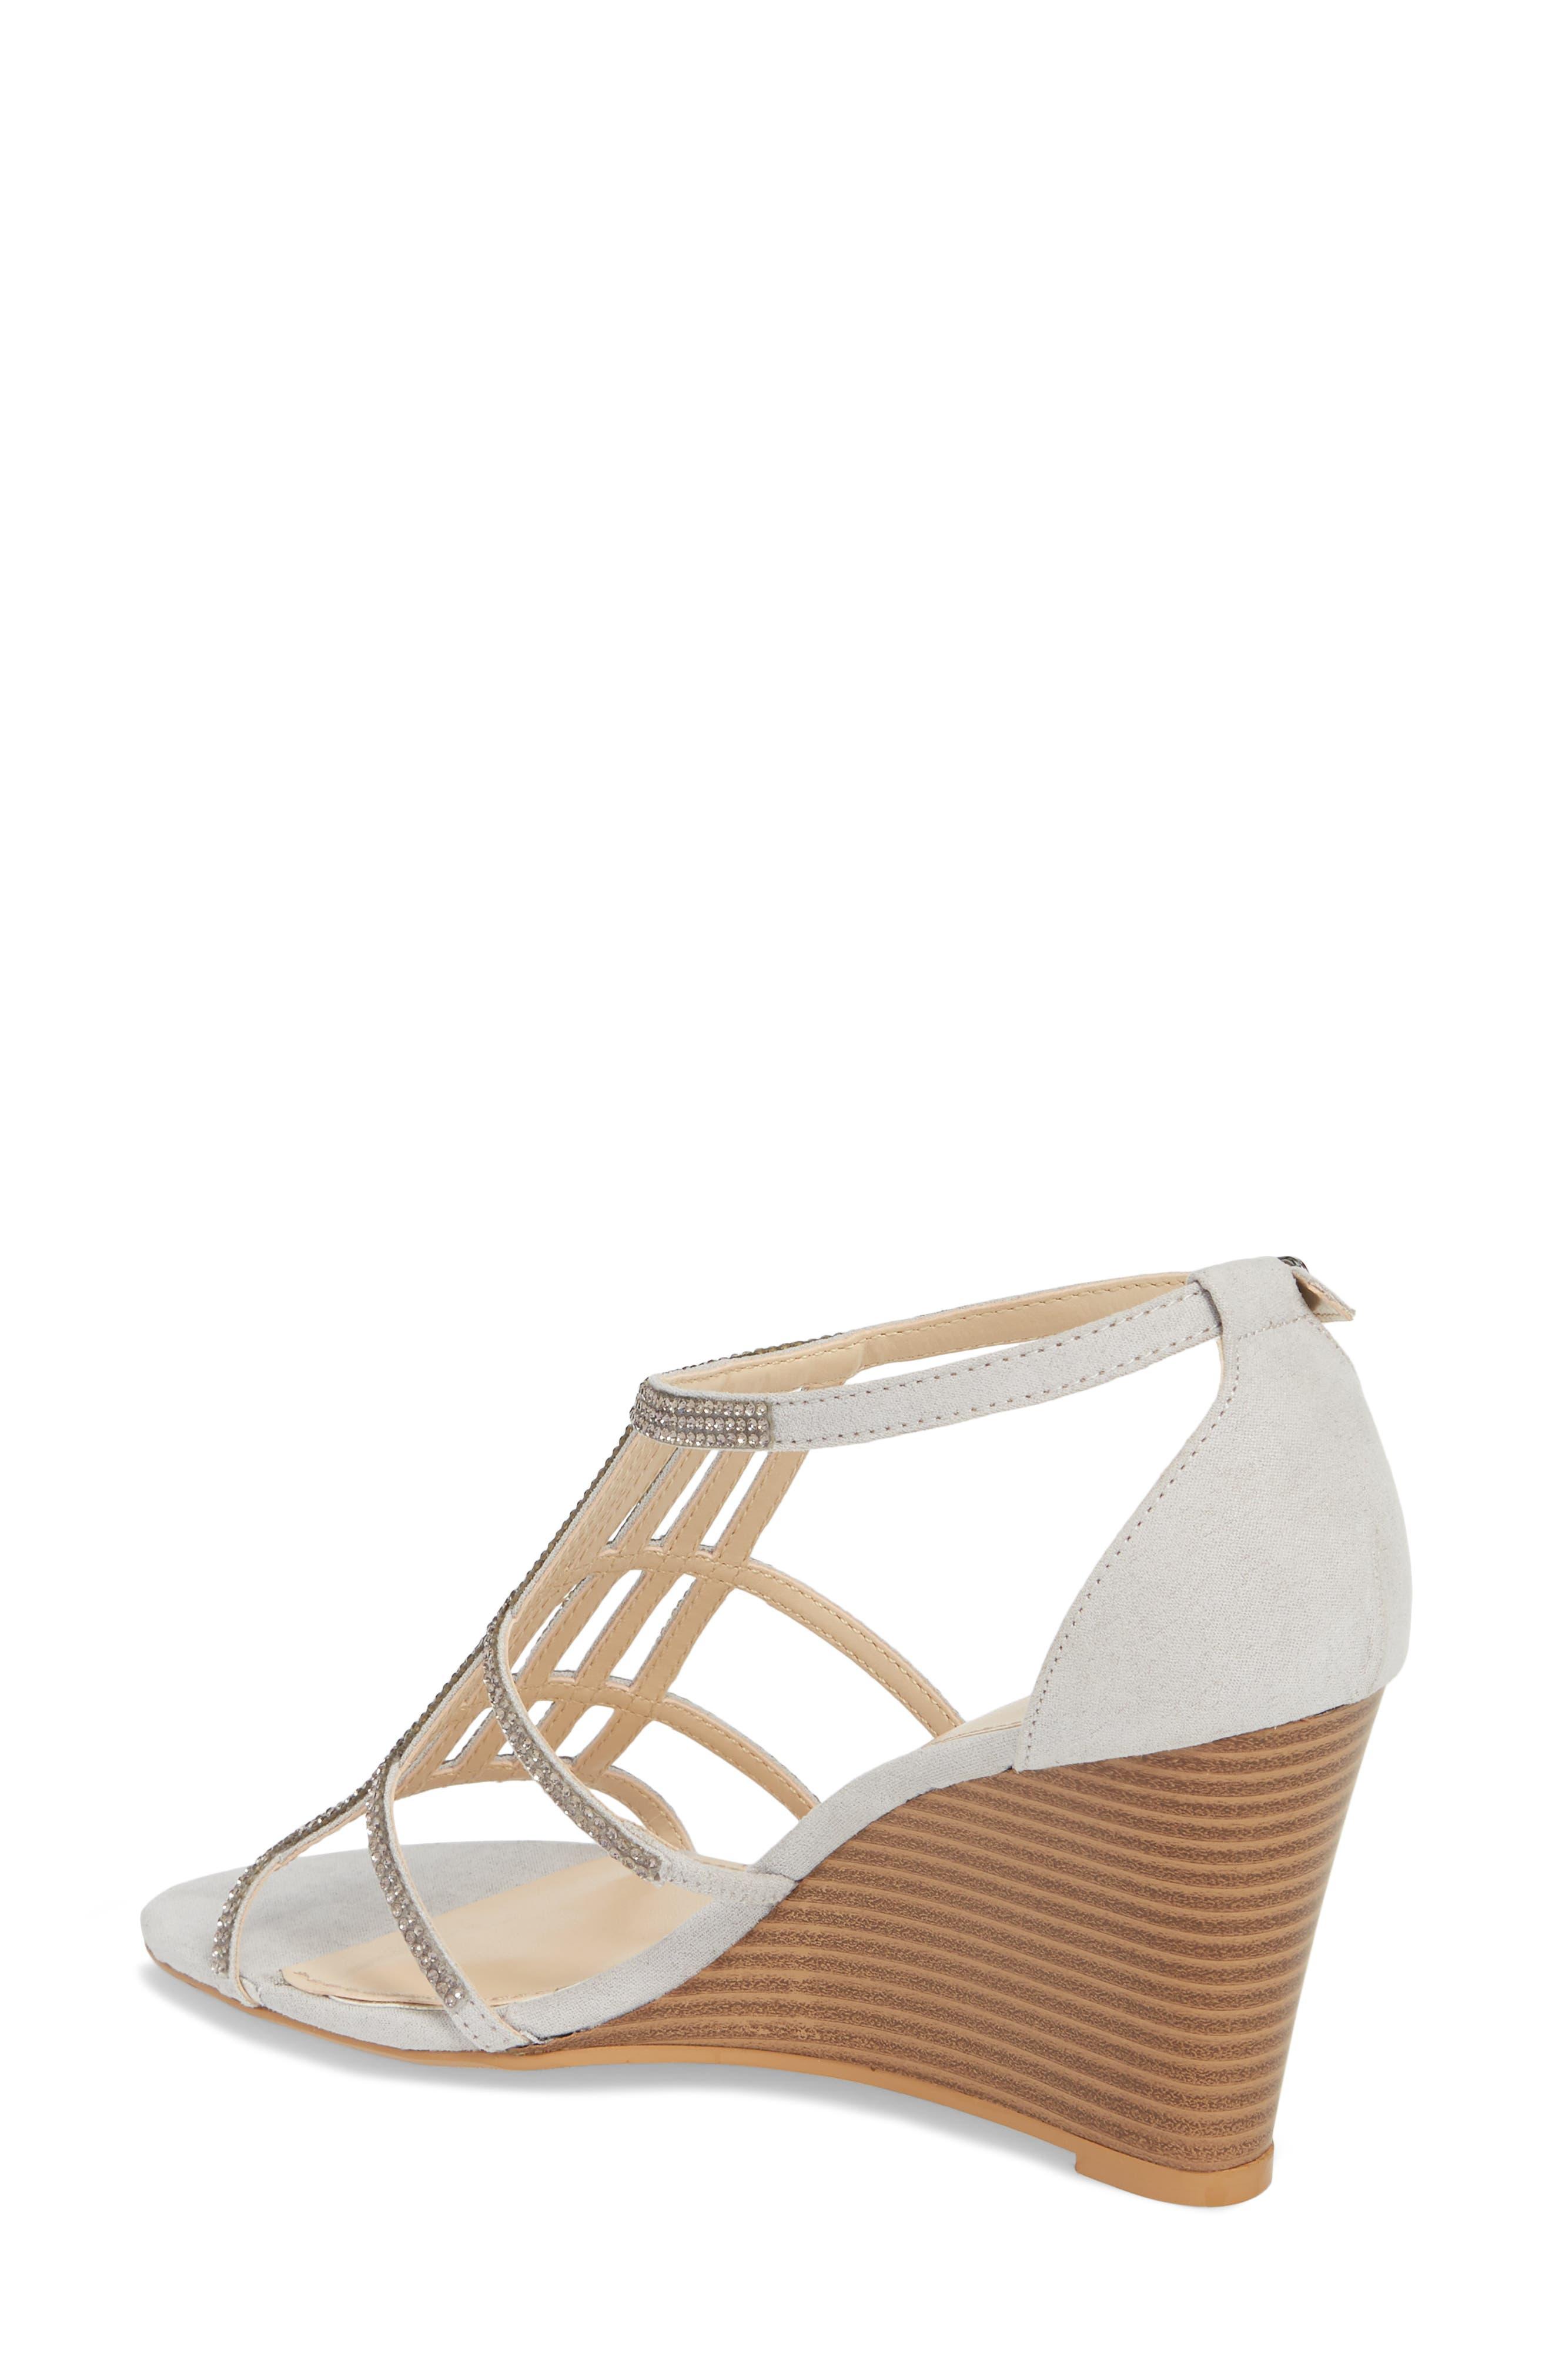 Hampton Crystal Embellished Wedge Sandal,                             Alternate thumbnail 2, color,                             Grey Suede